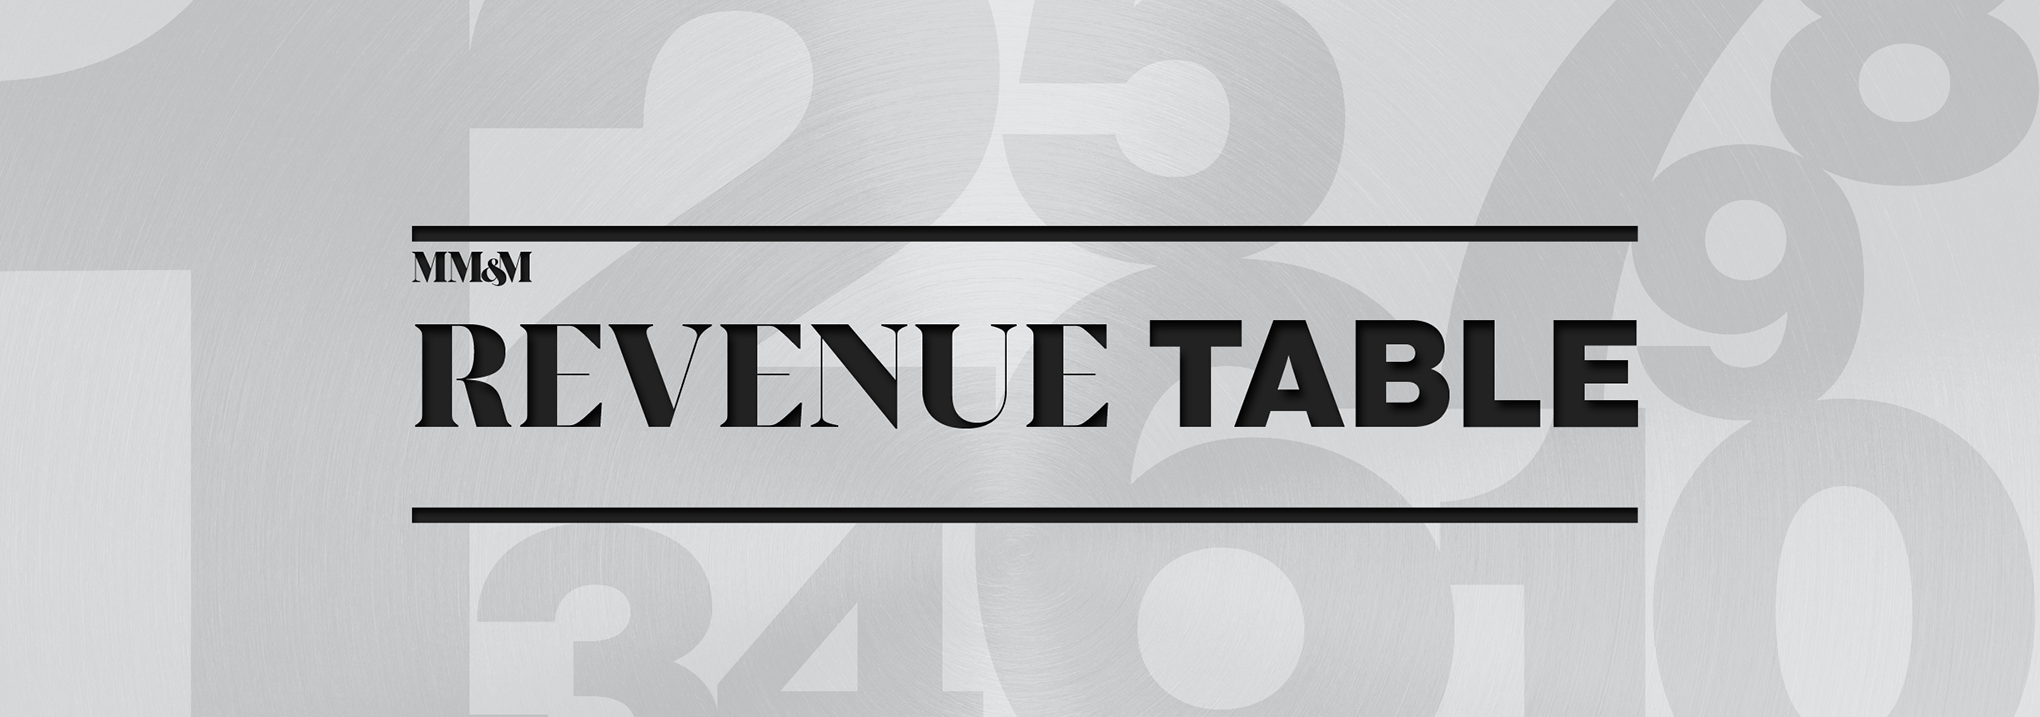 Revenue Table